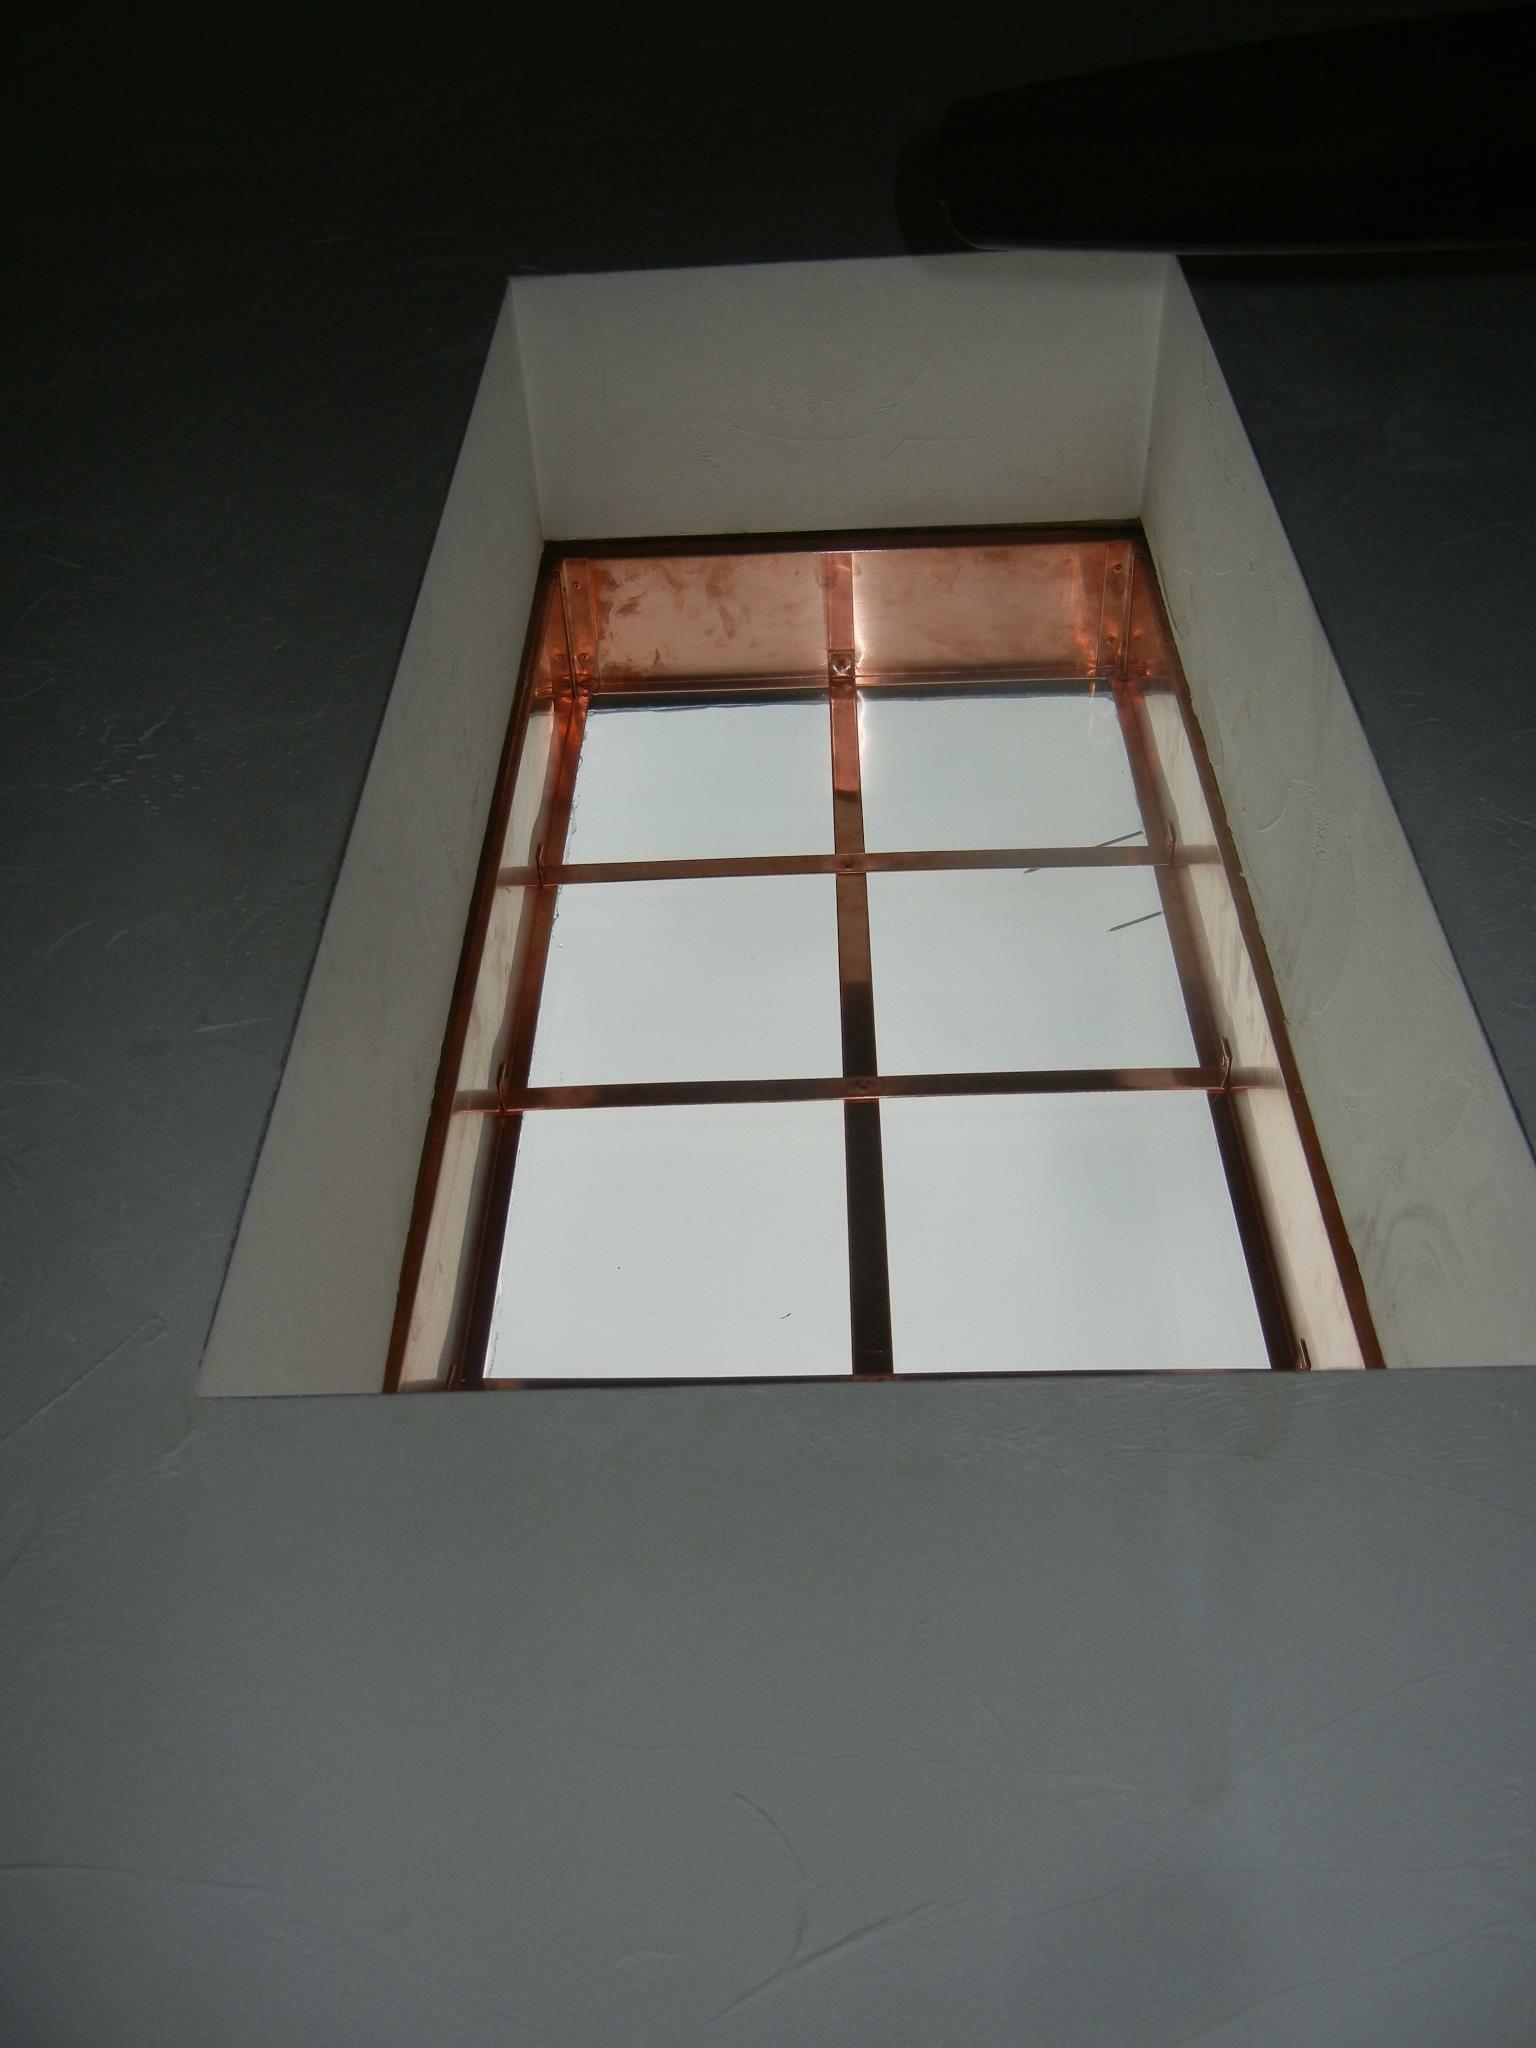 Joey Wildasin Slate Roofing image 35